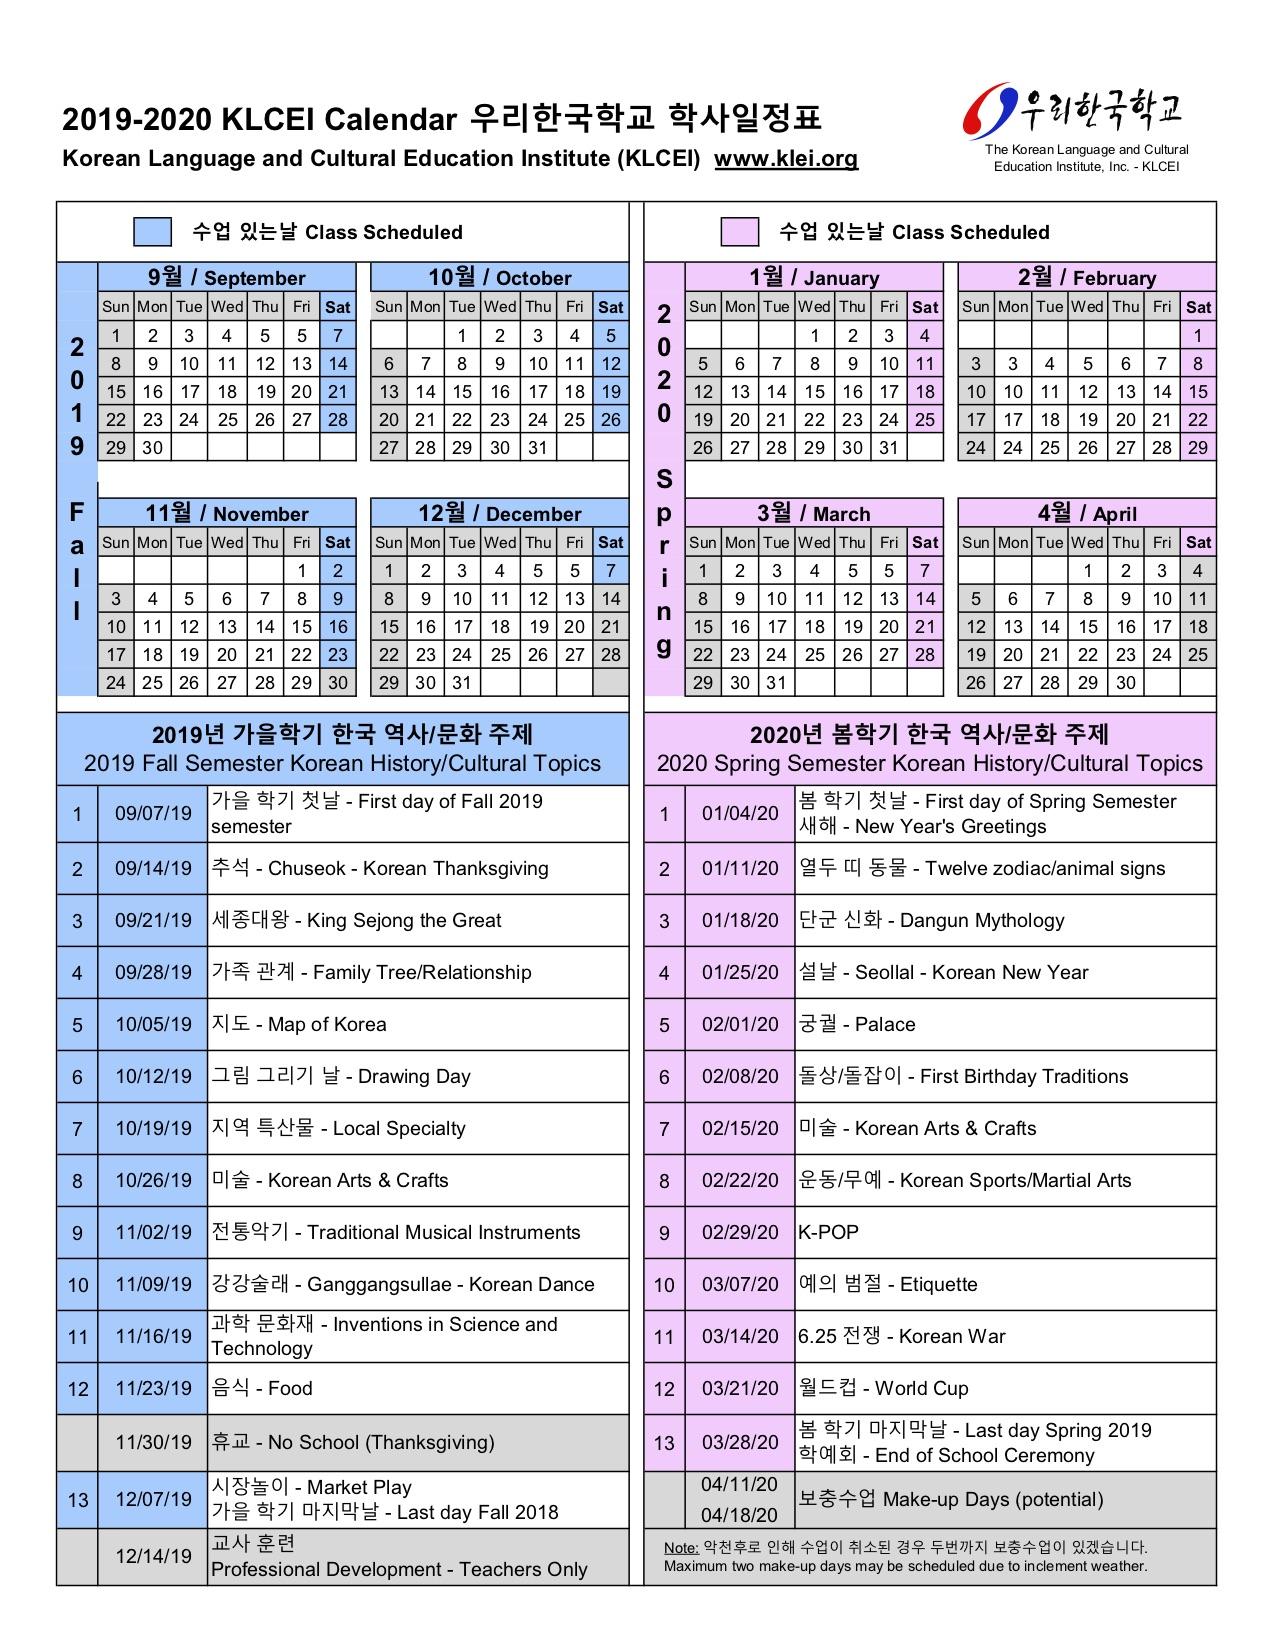 2019/2020 School Calendar